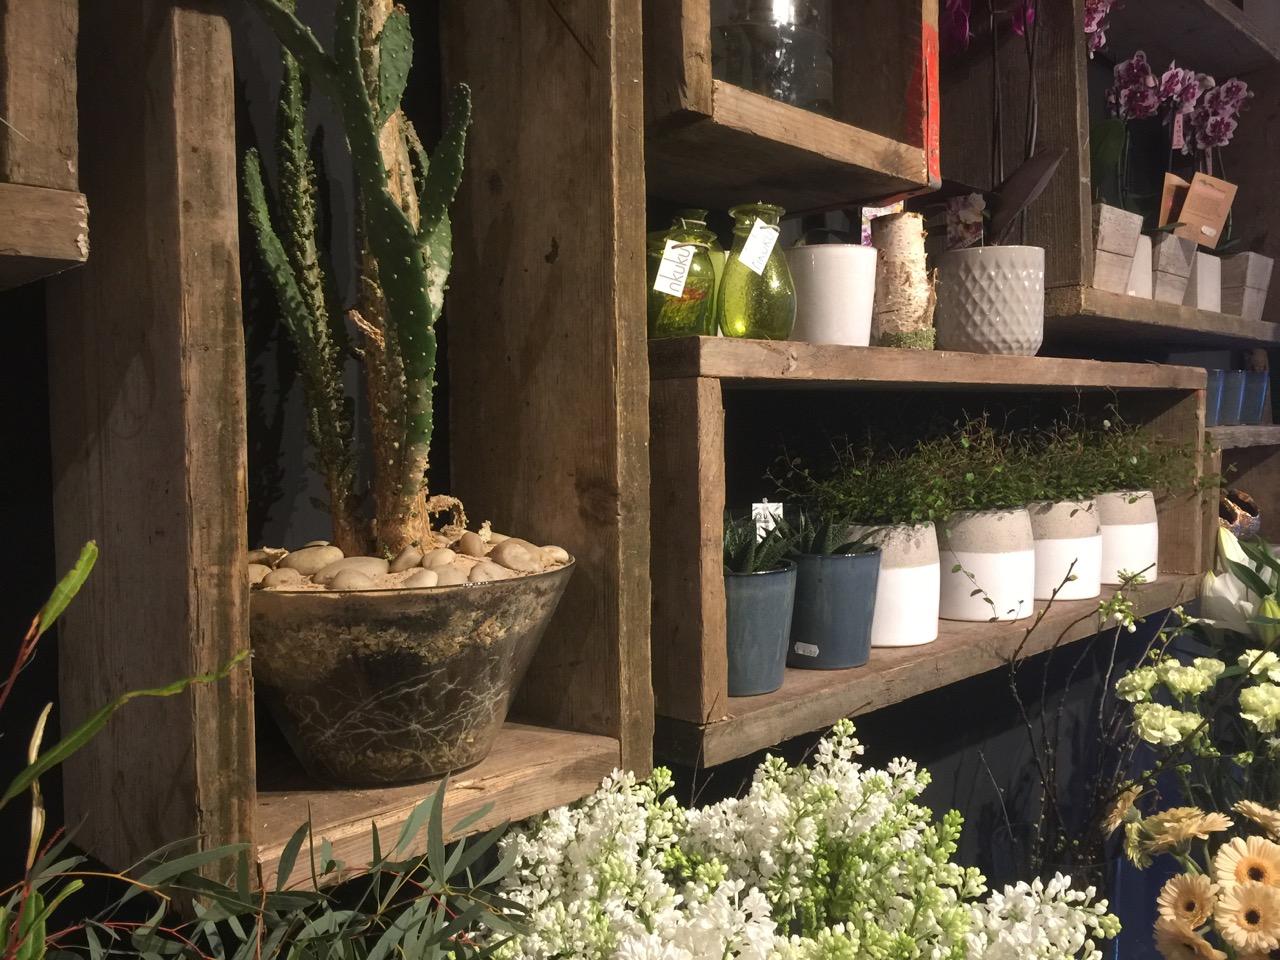 A little glimpse of the shop…